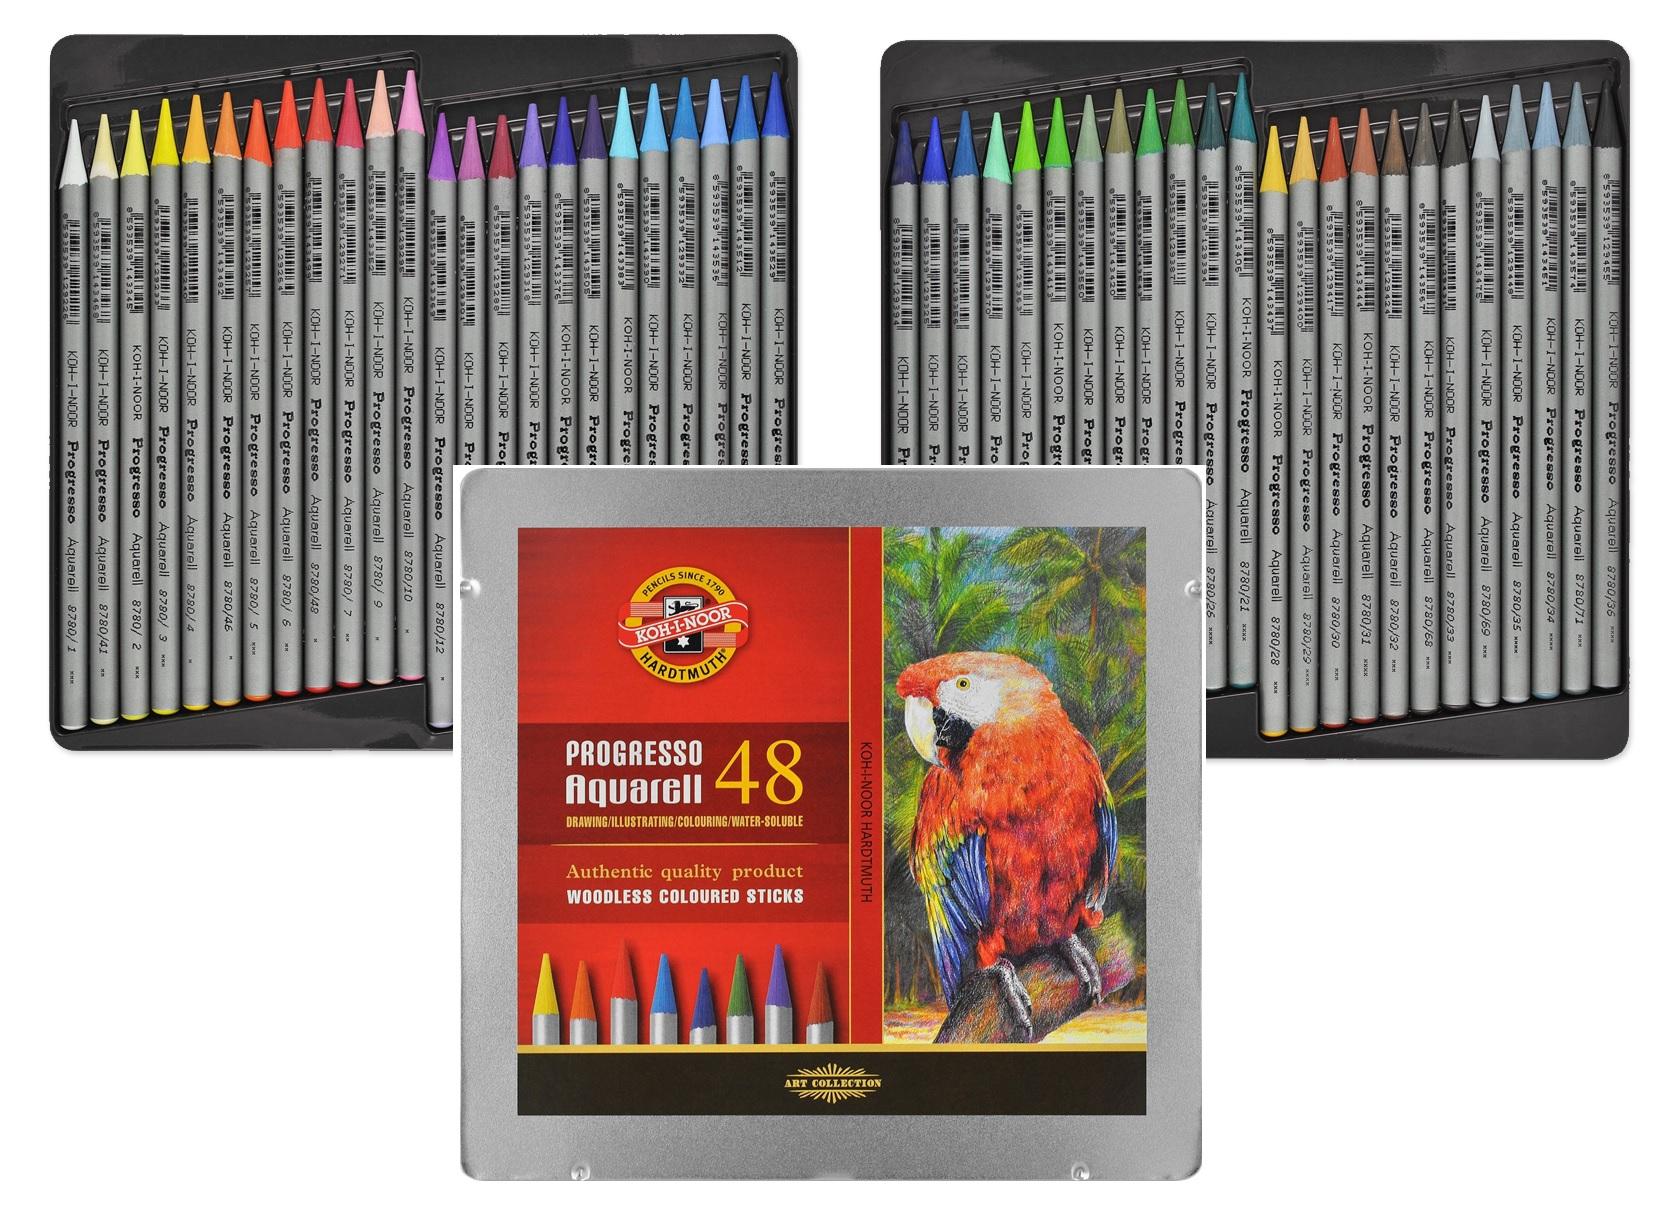 Ceruzky woodless KOH-I-NOOR PROGRESSO bol vyvinutý 48